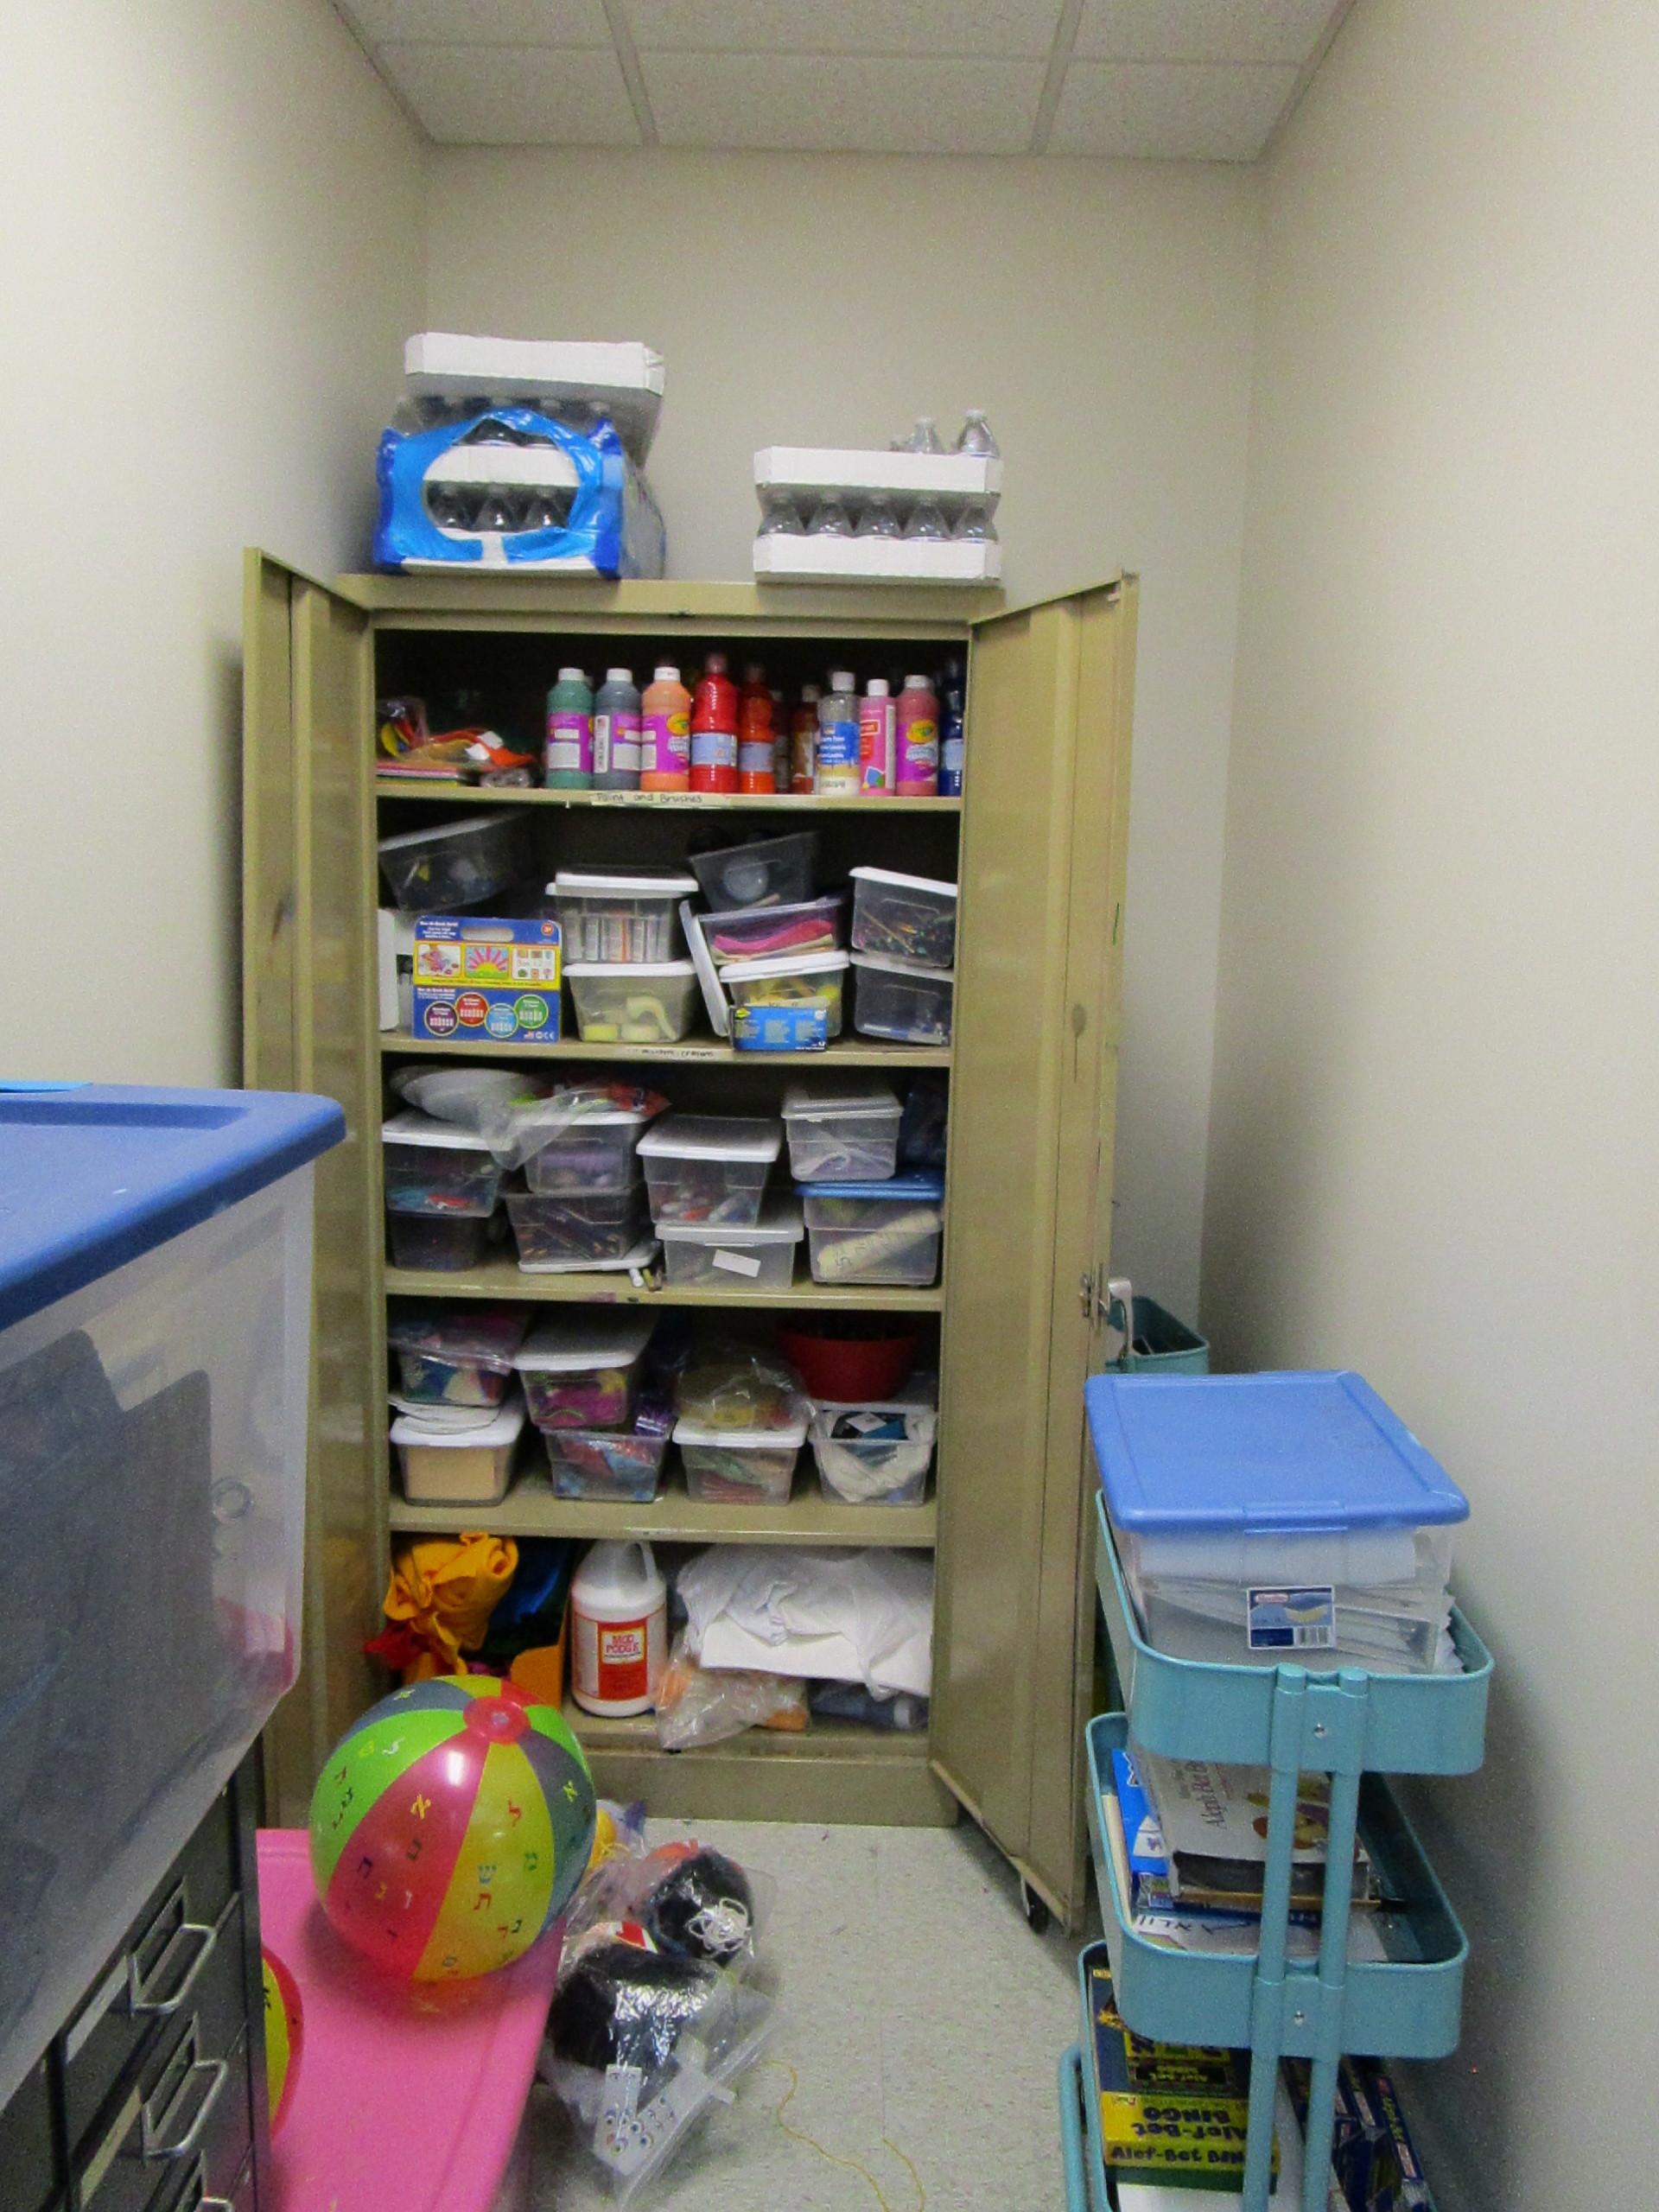 Supply Closet Before